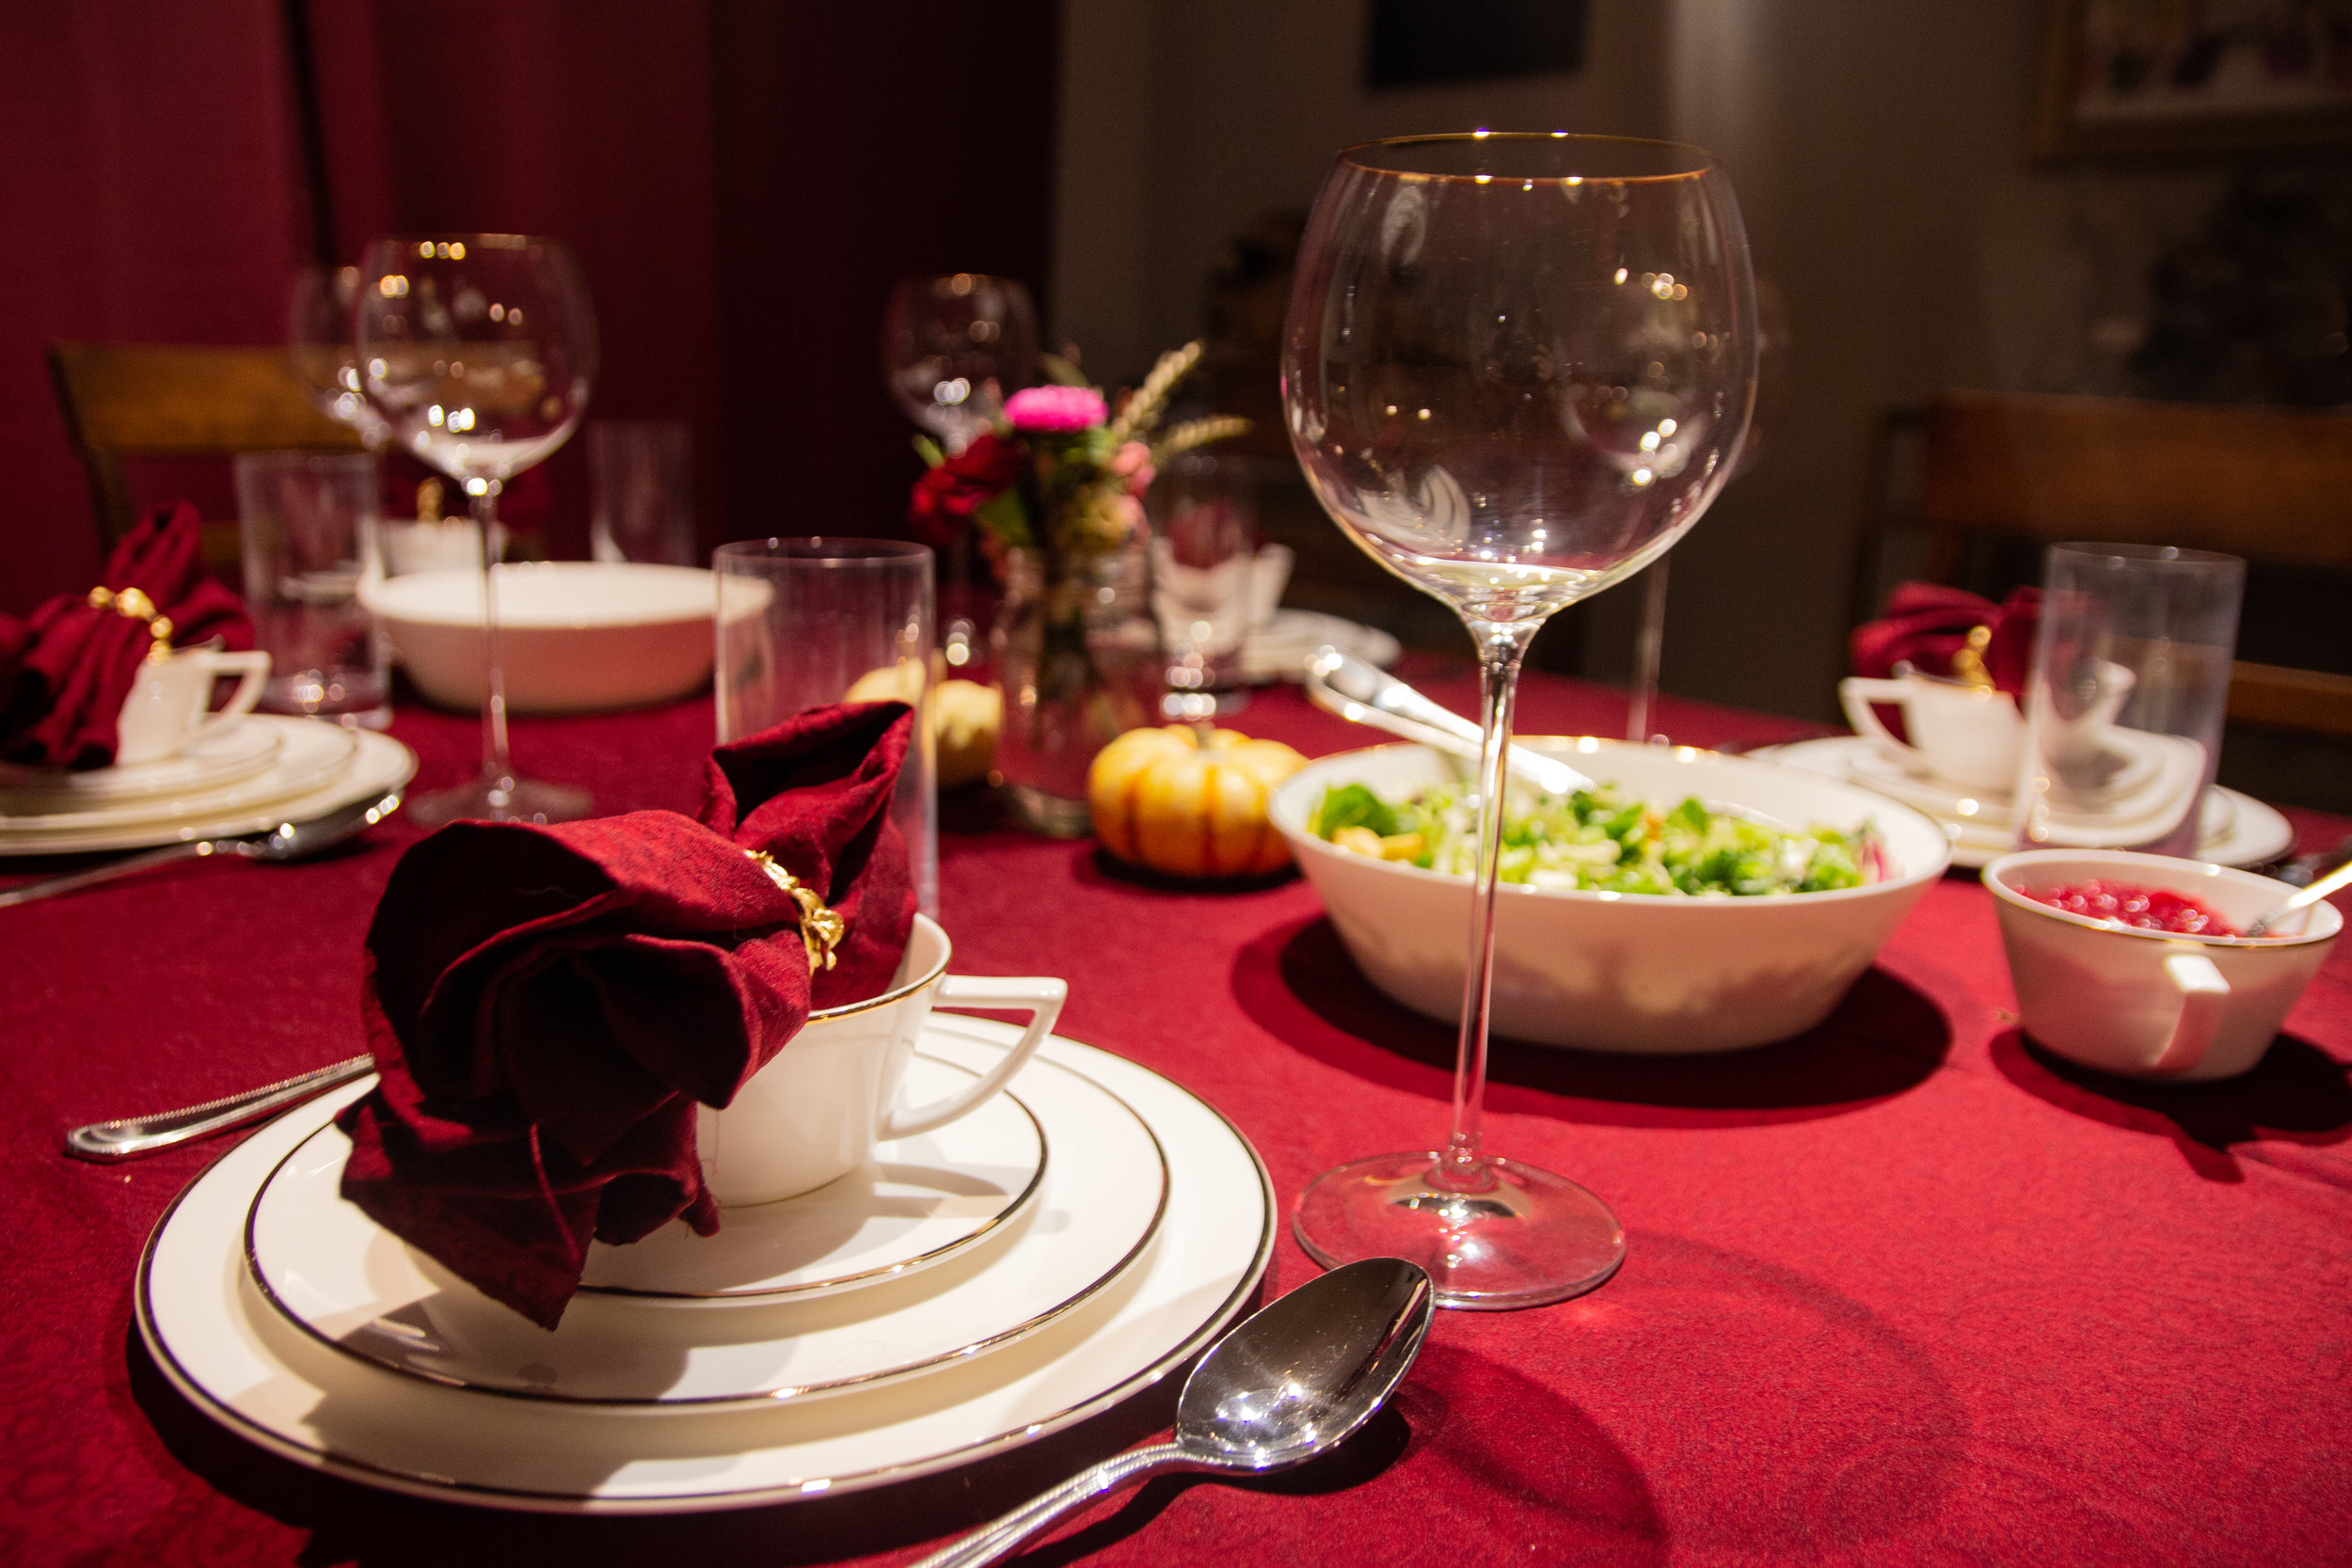 vegetarian holiday meal ideas, vegetarian friendly thanksgiving, vegetarian christmas meal